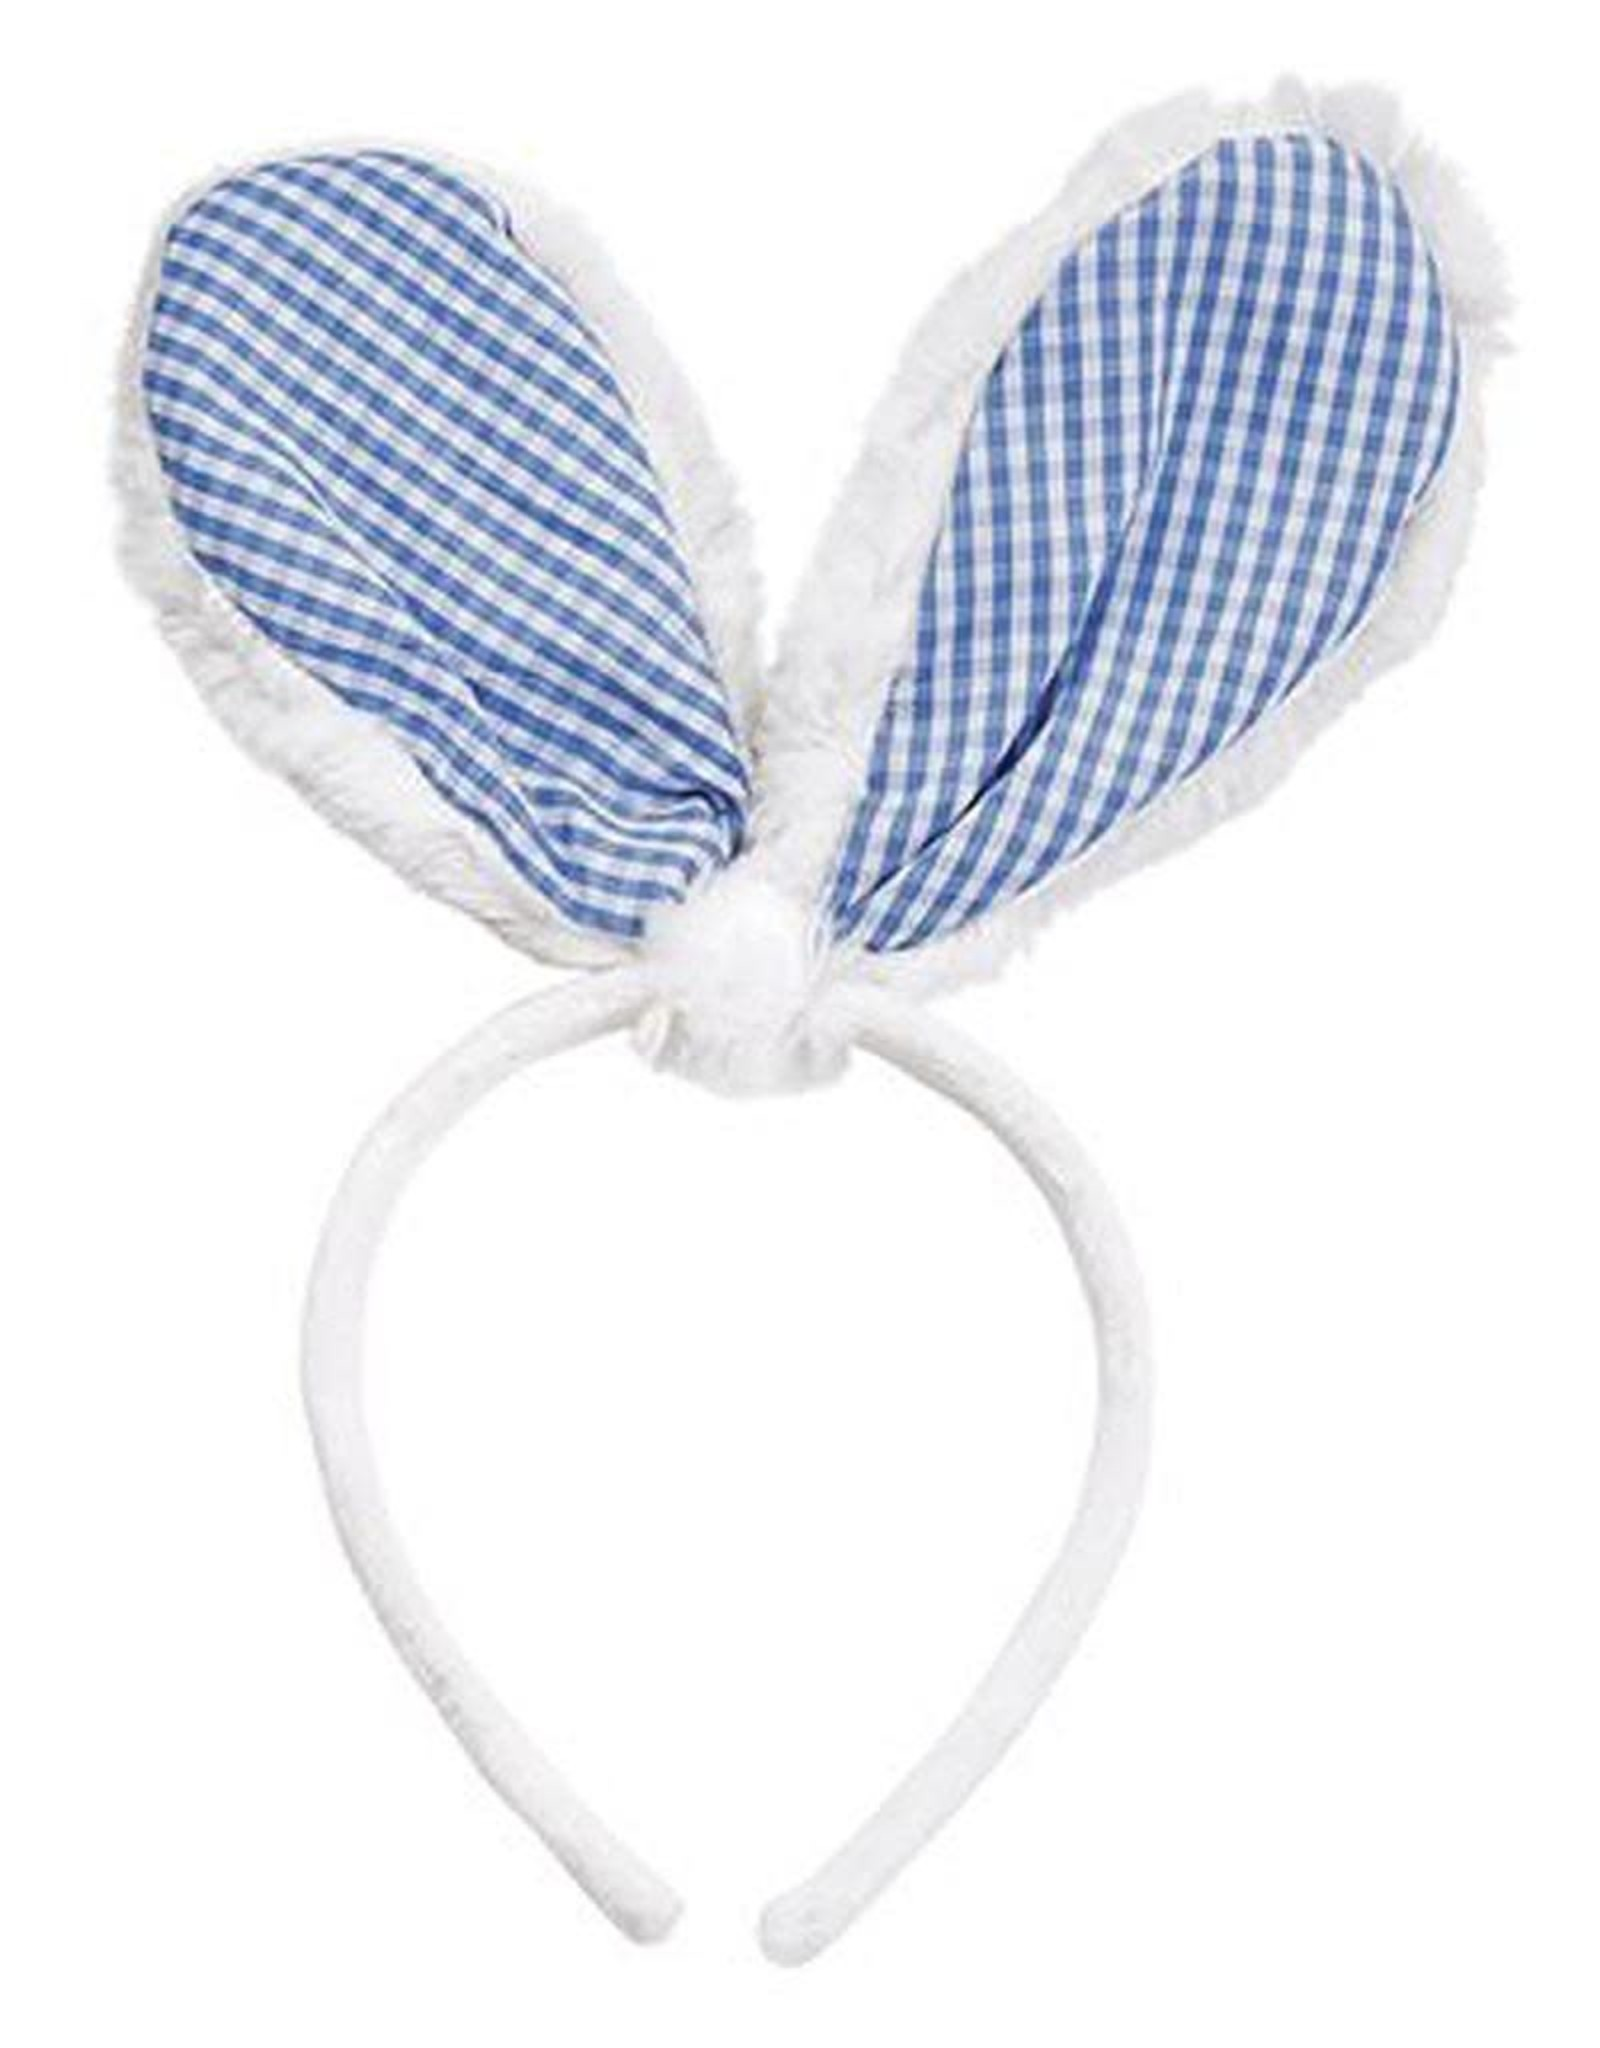 Mud Pie Bunny Ears Headband - White w Blue Gingham